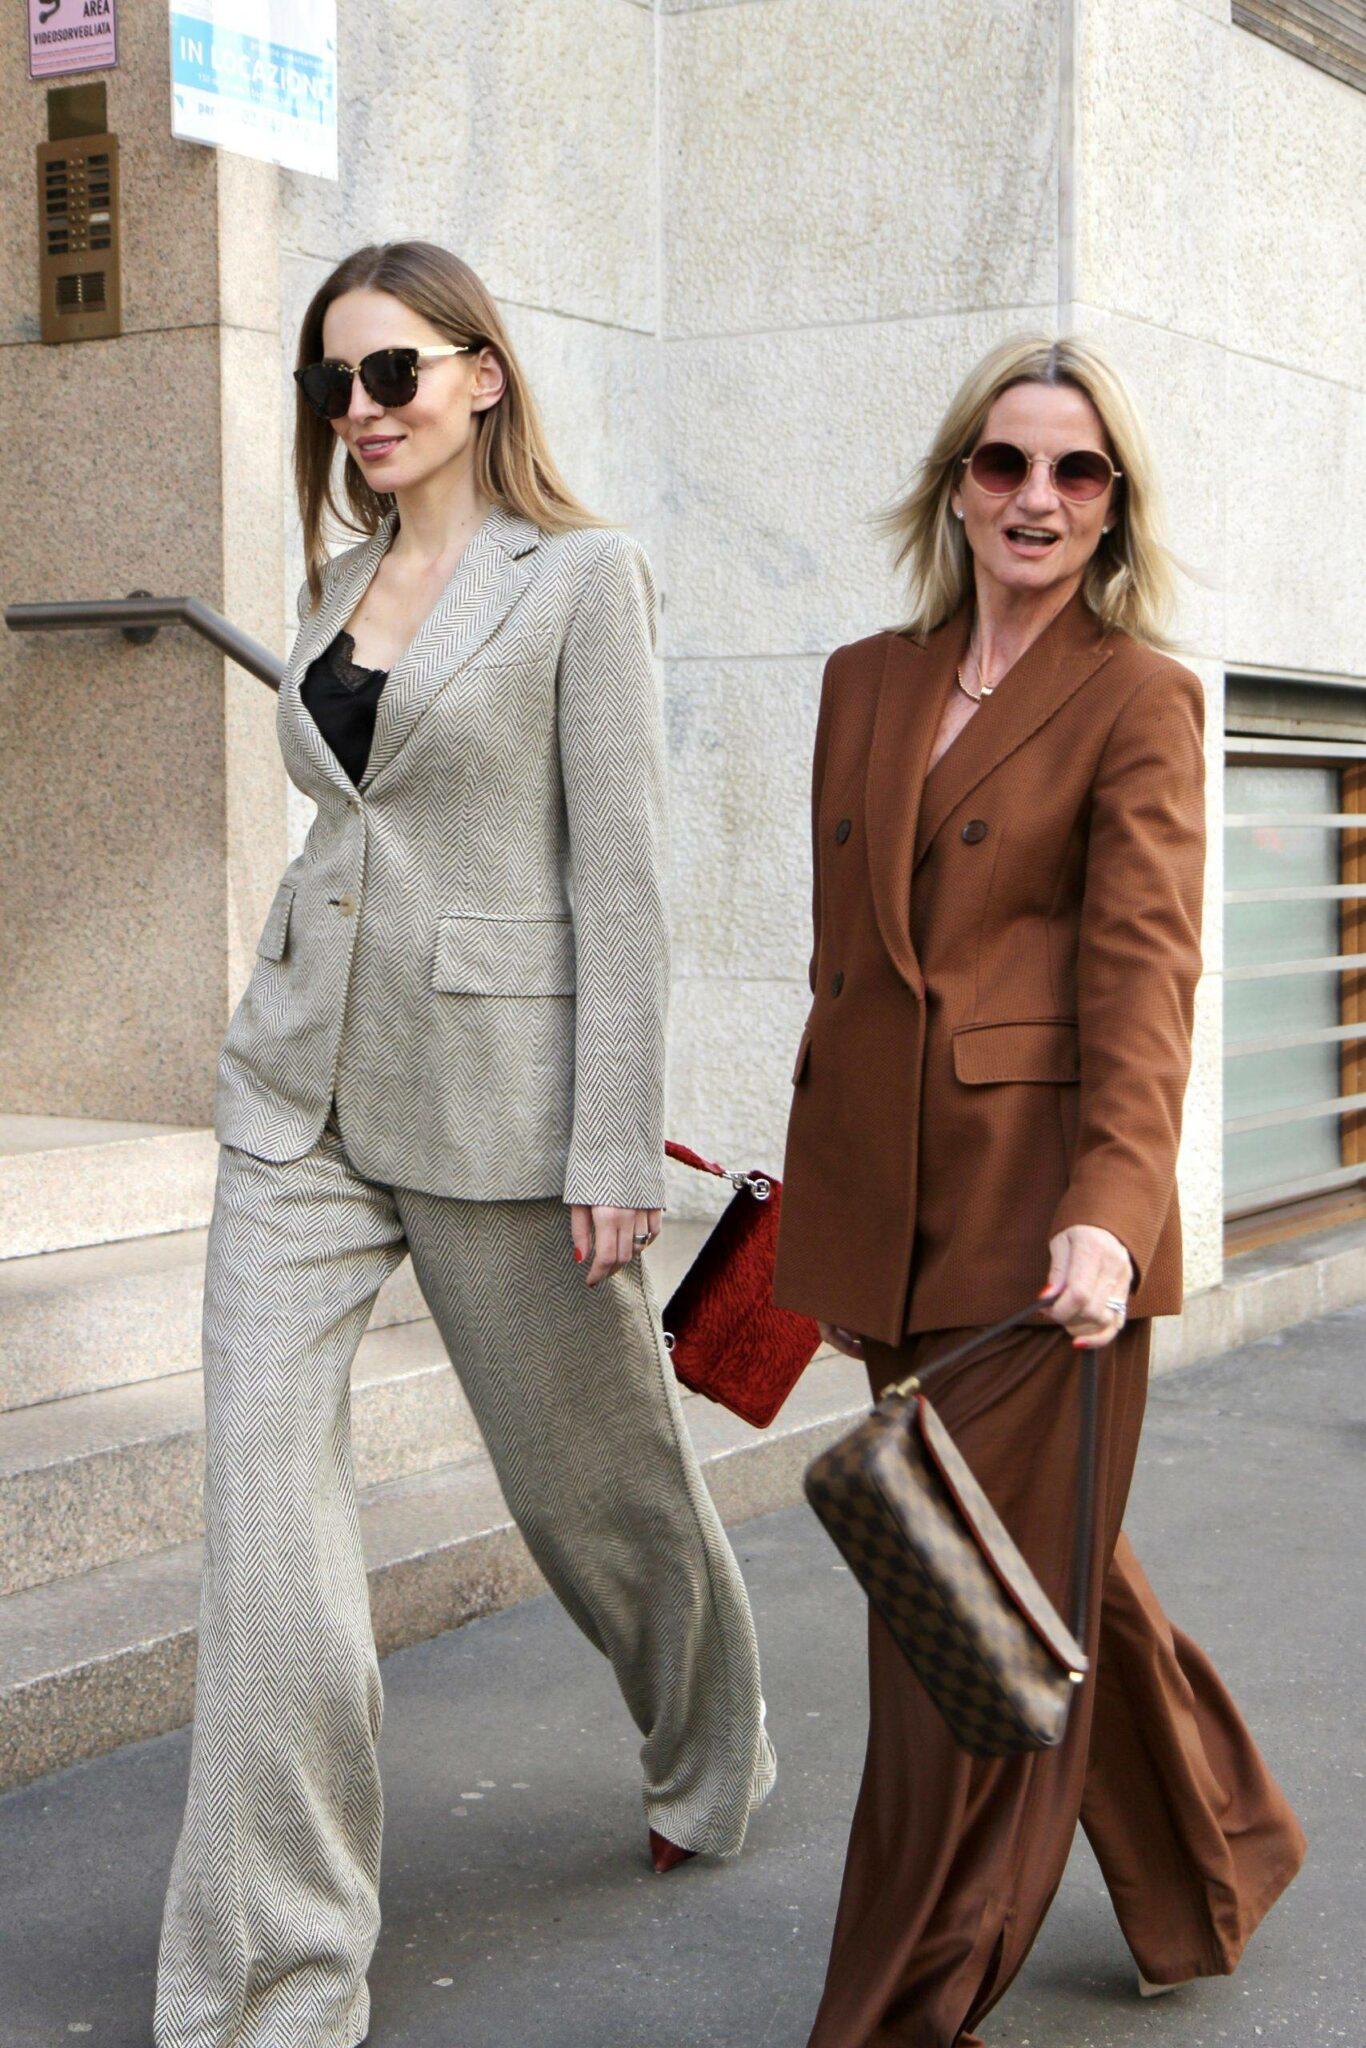 Bellazofia and Funkyforty wearing MaxMara clothes in Milan,